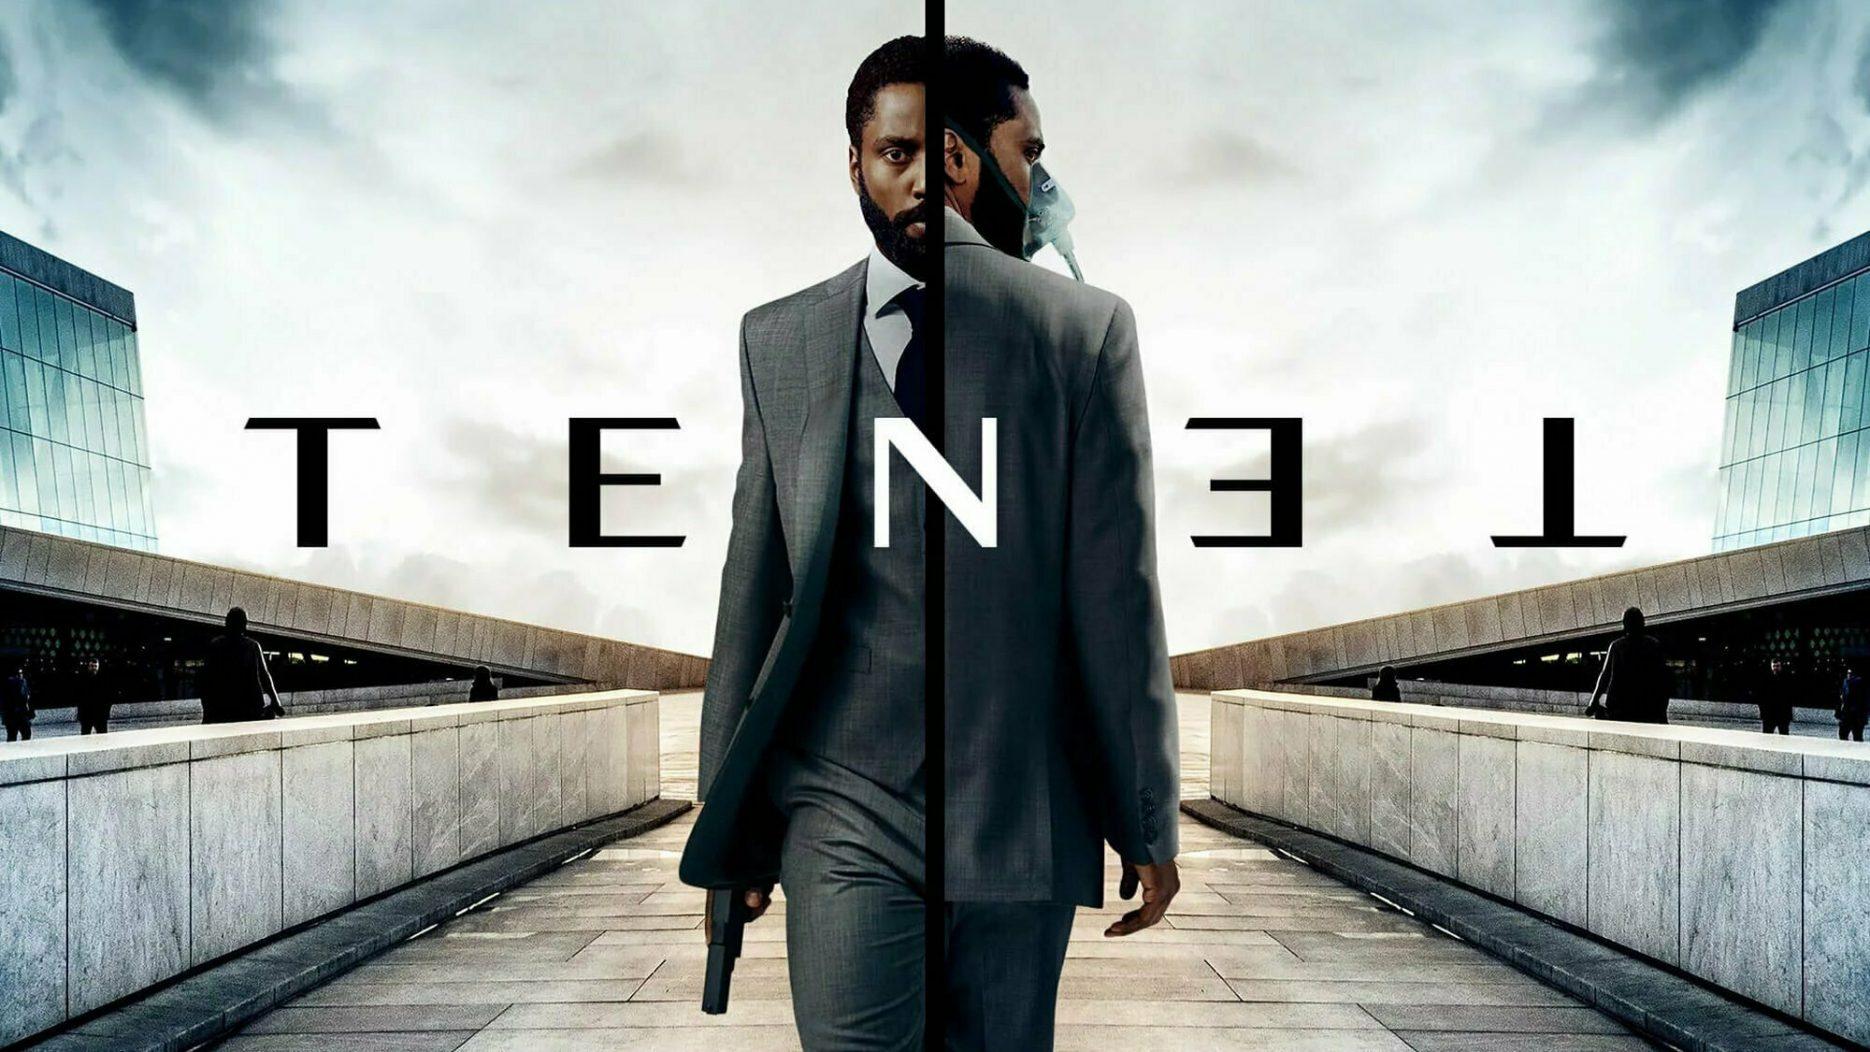 Tenet (Christopher Nolan)